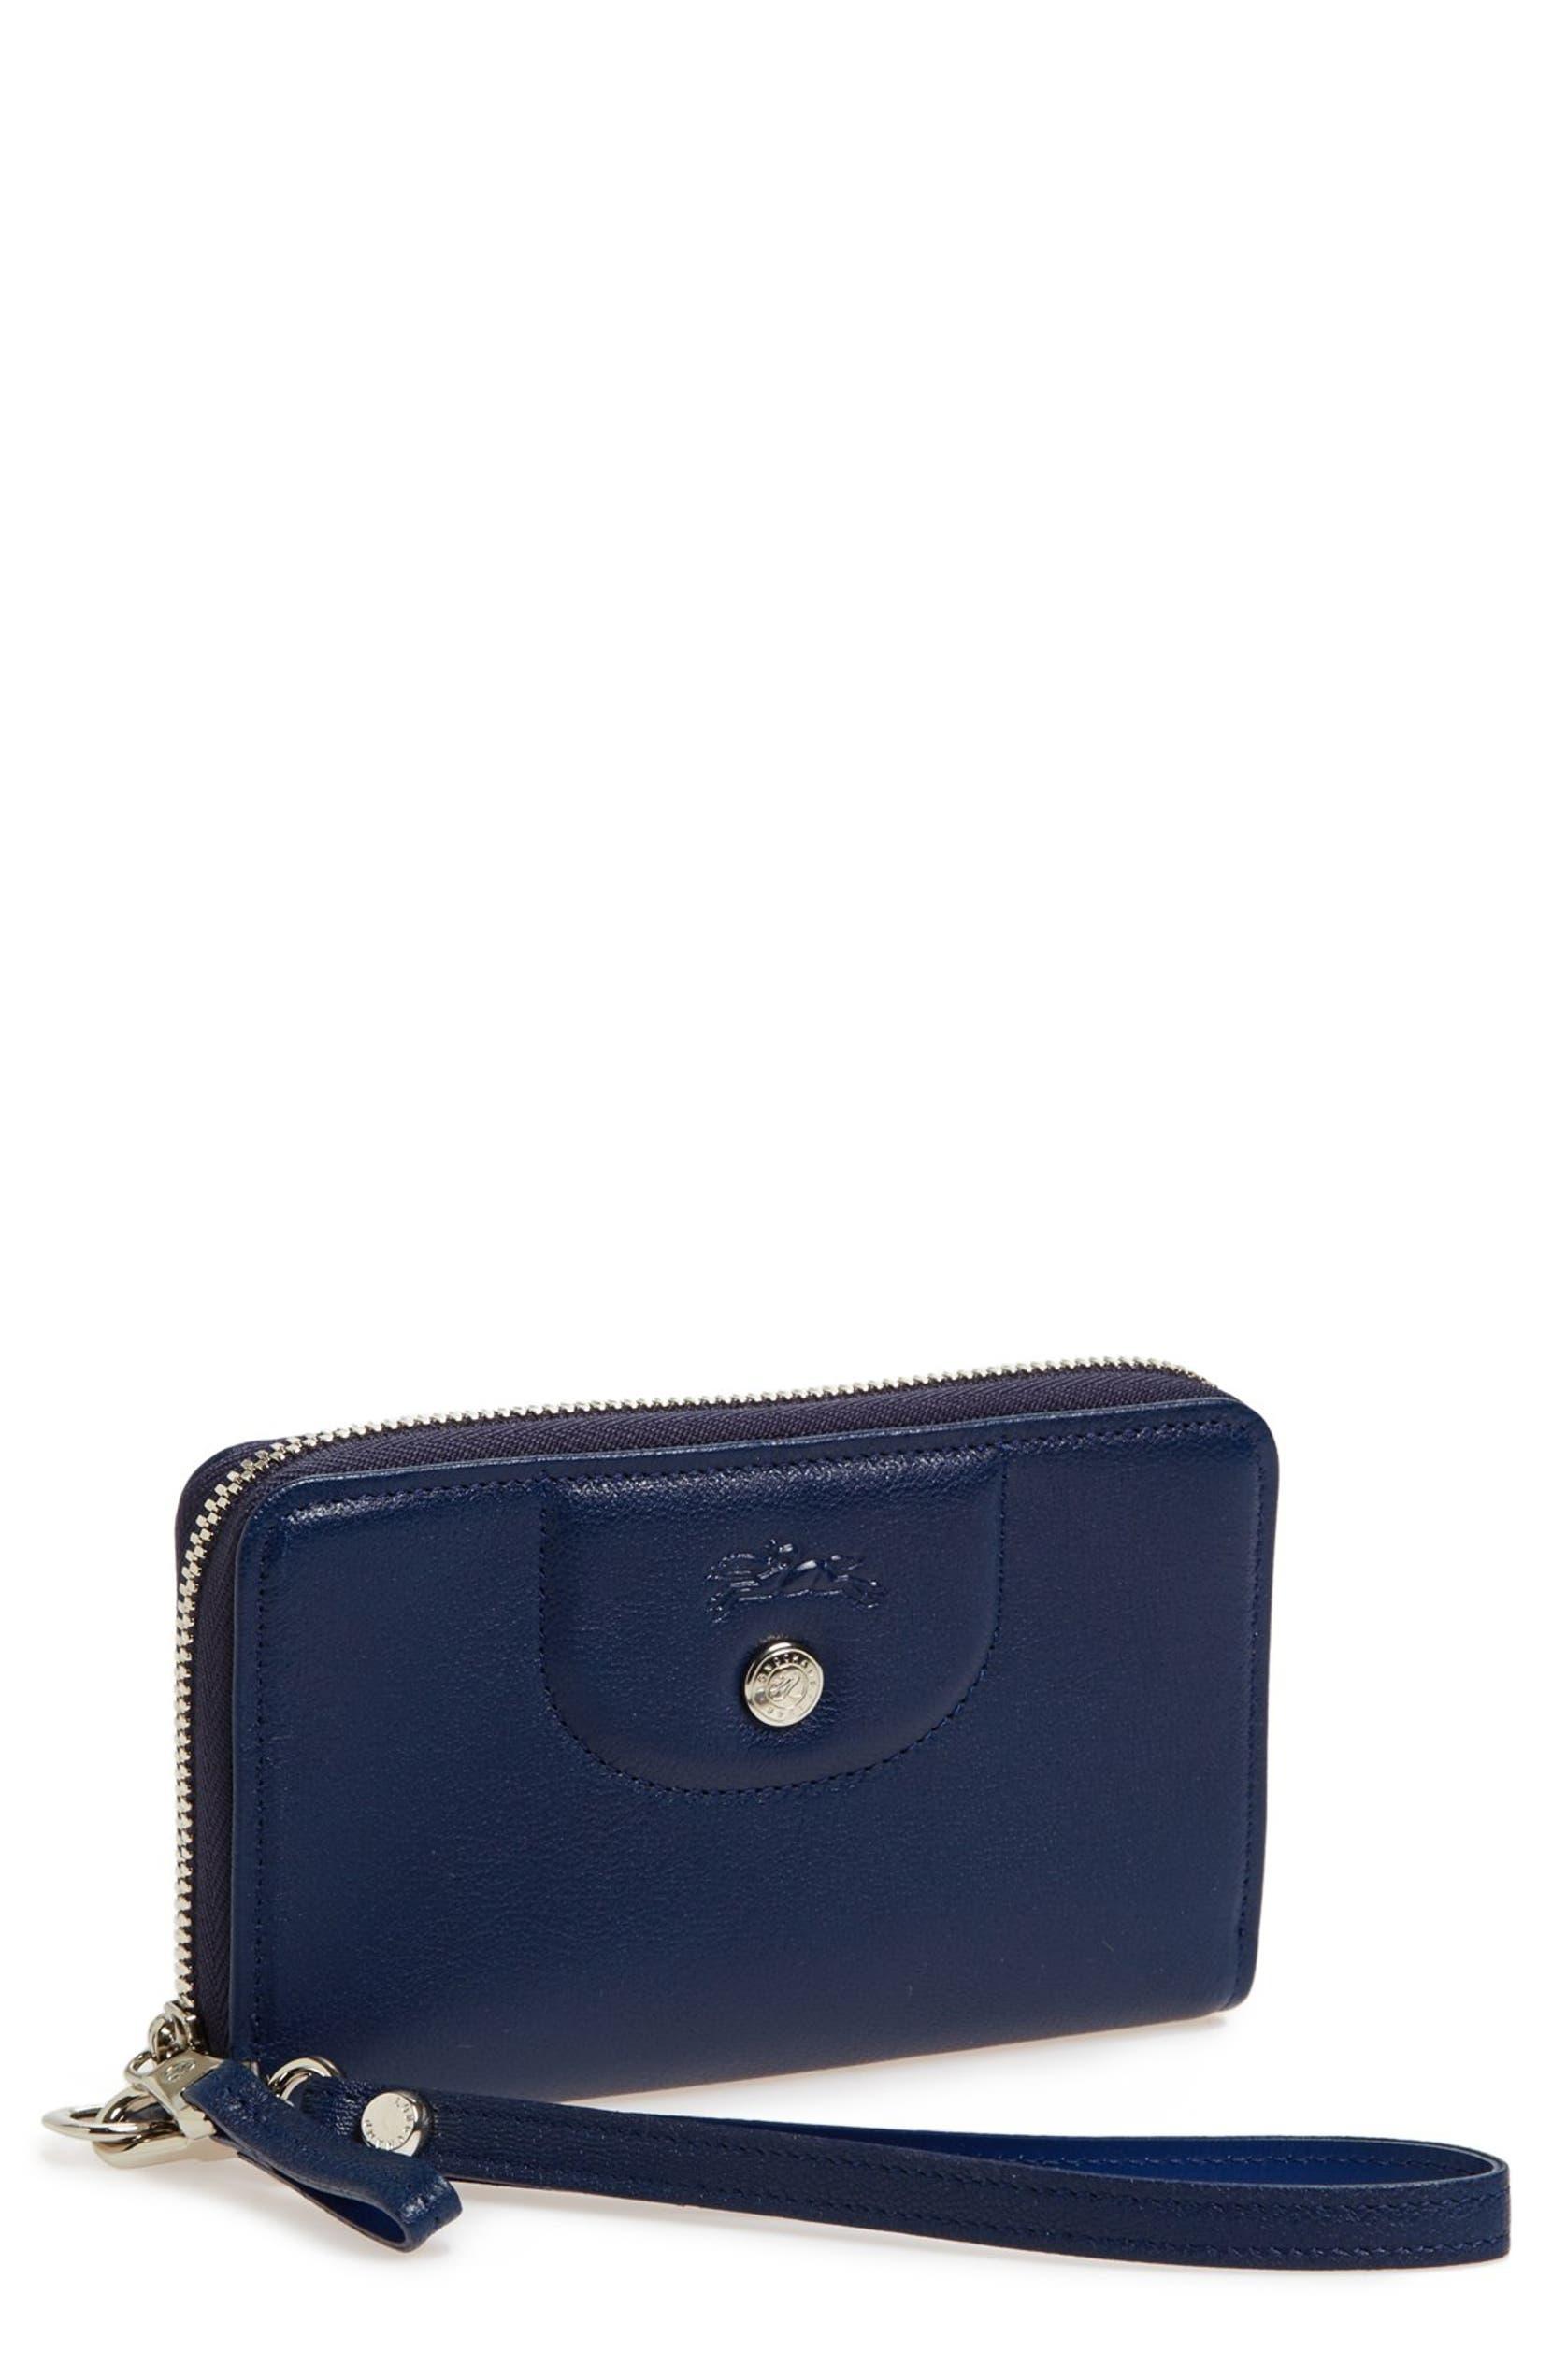 4072afc6bd Longchamp 'Le Pliage - Cuir' Zip Around Wallet | Nordstrom